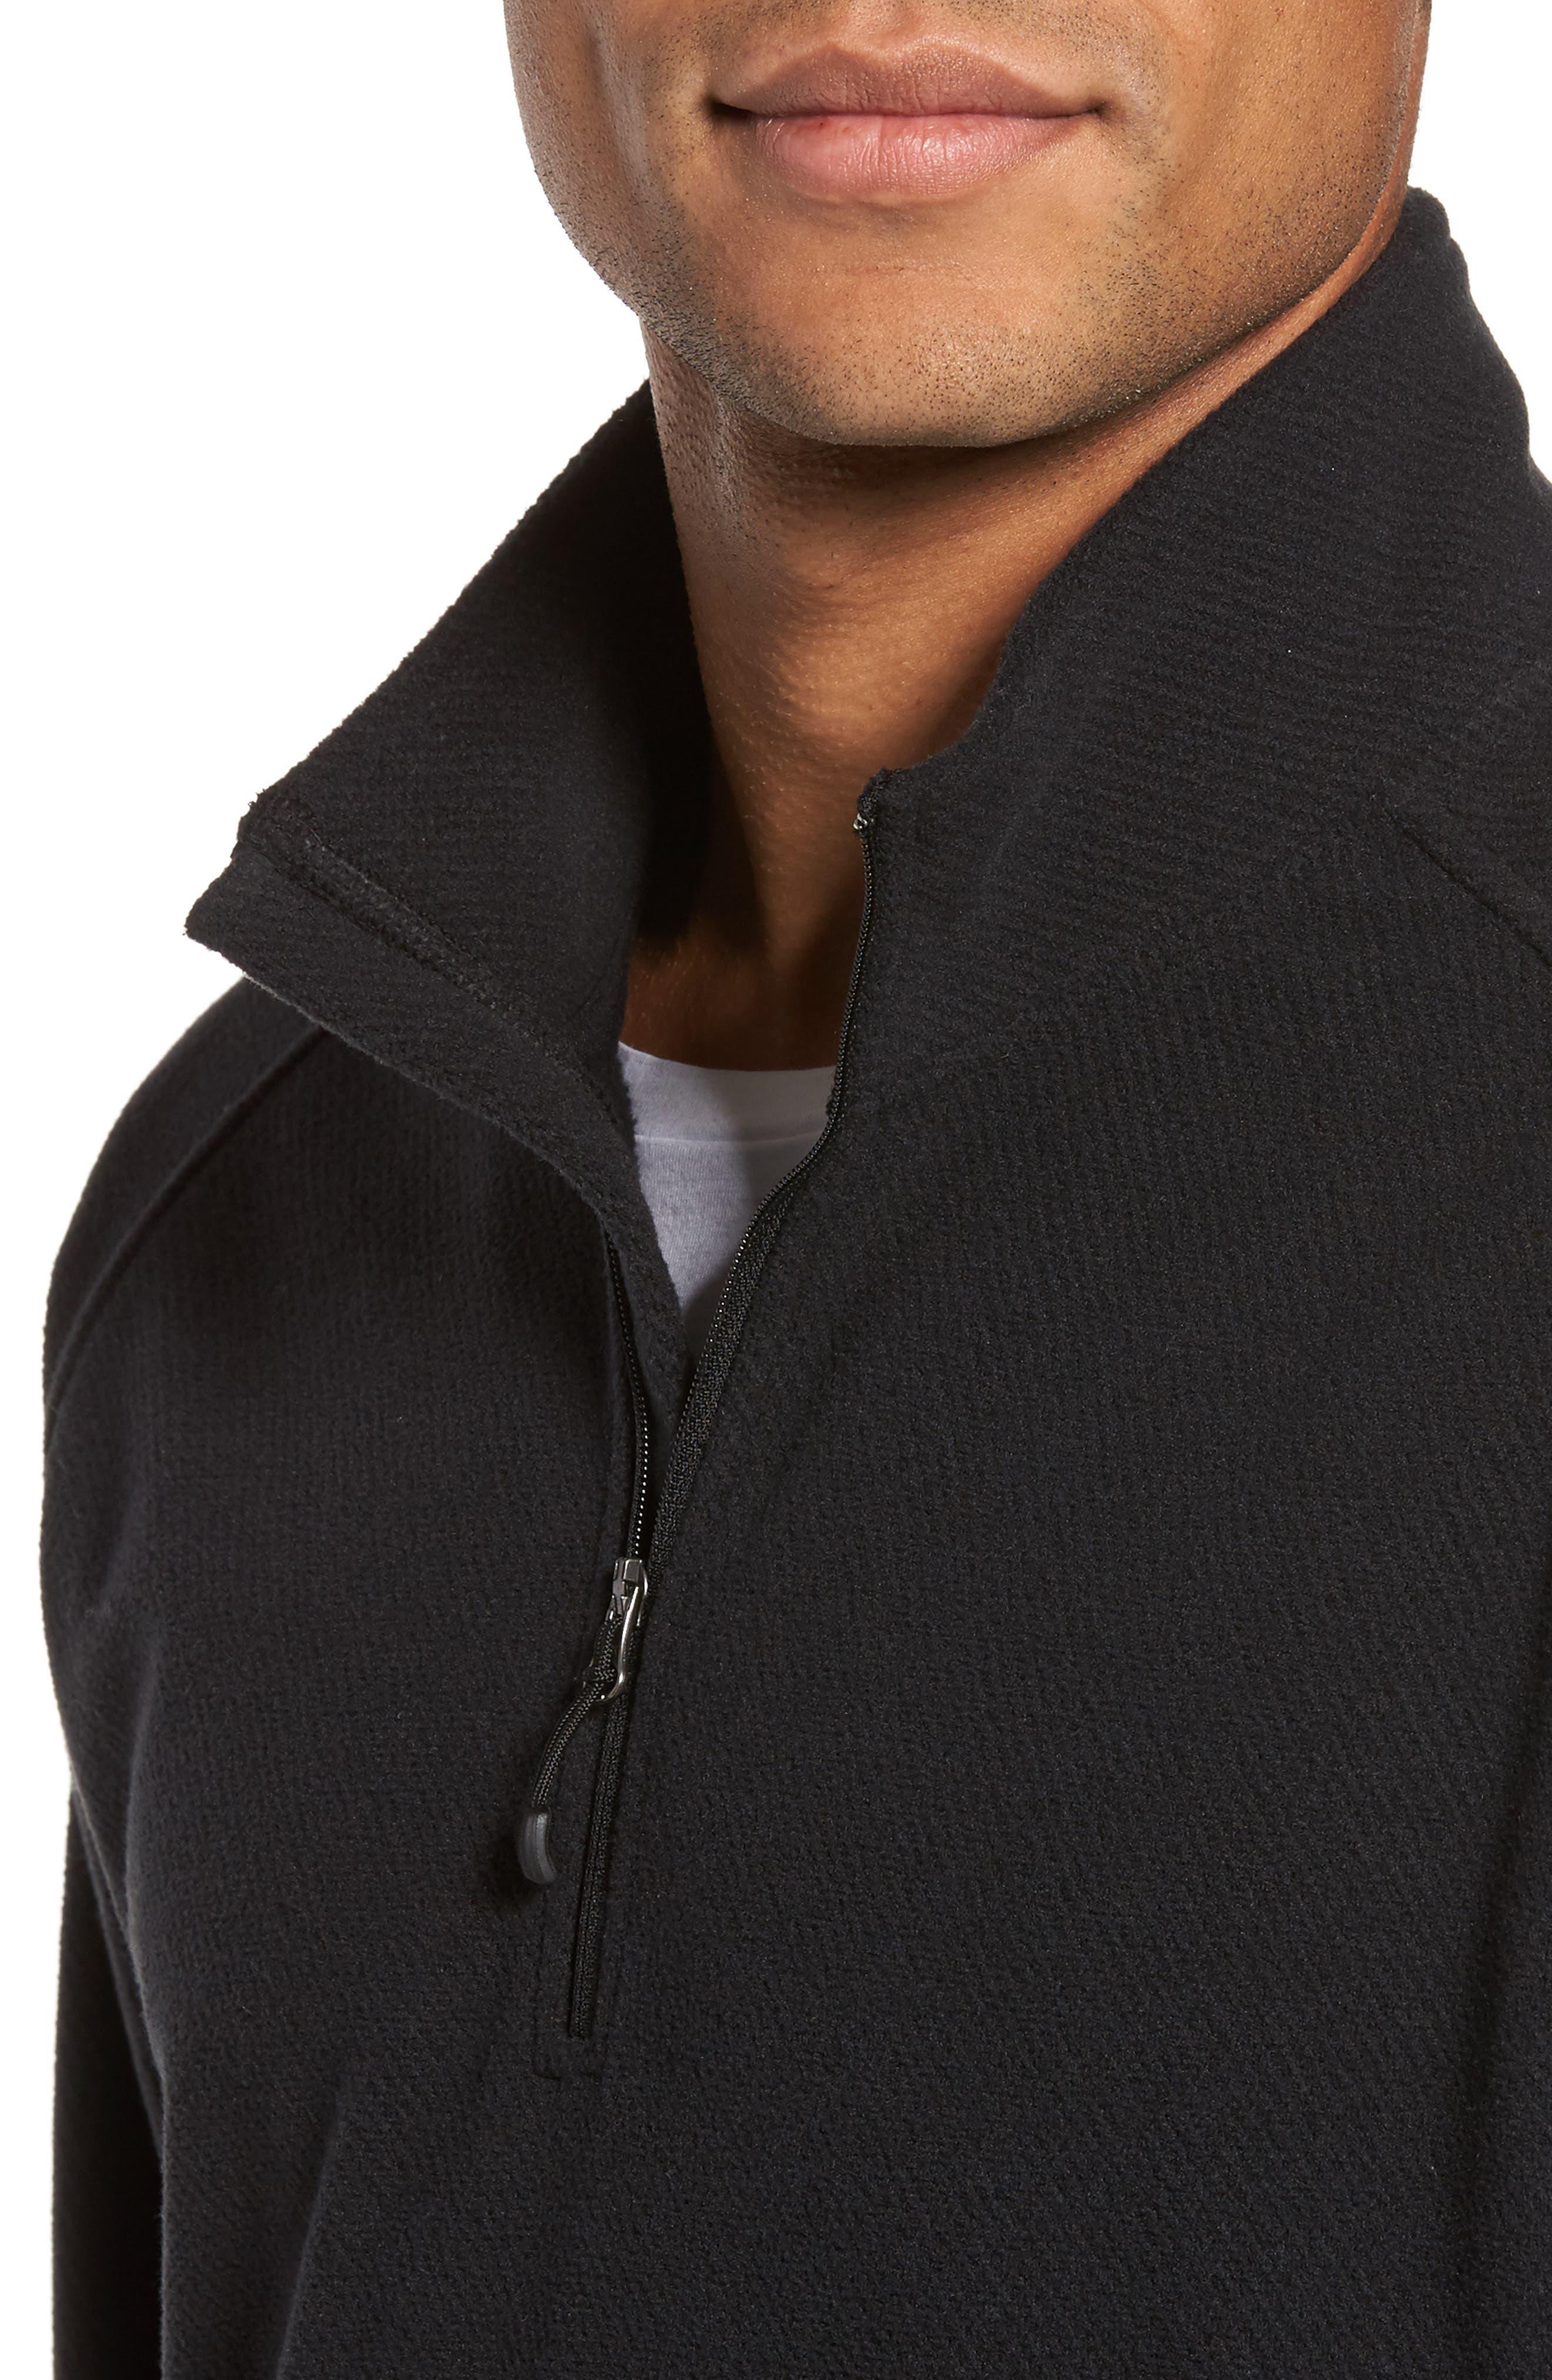 Quarter Zip Fleece Pullover,                             Alternate thumbnail 4, color,                             Black Caviar